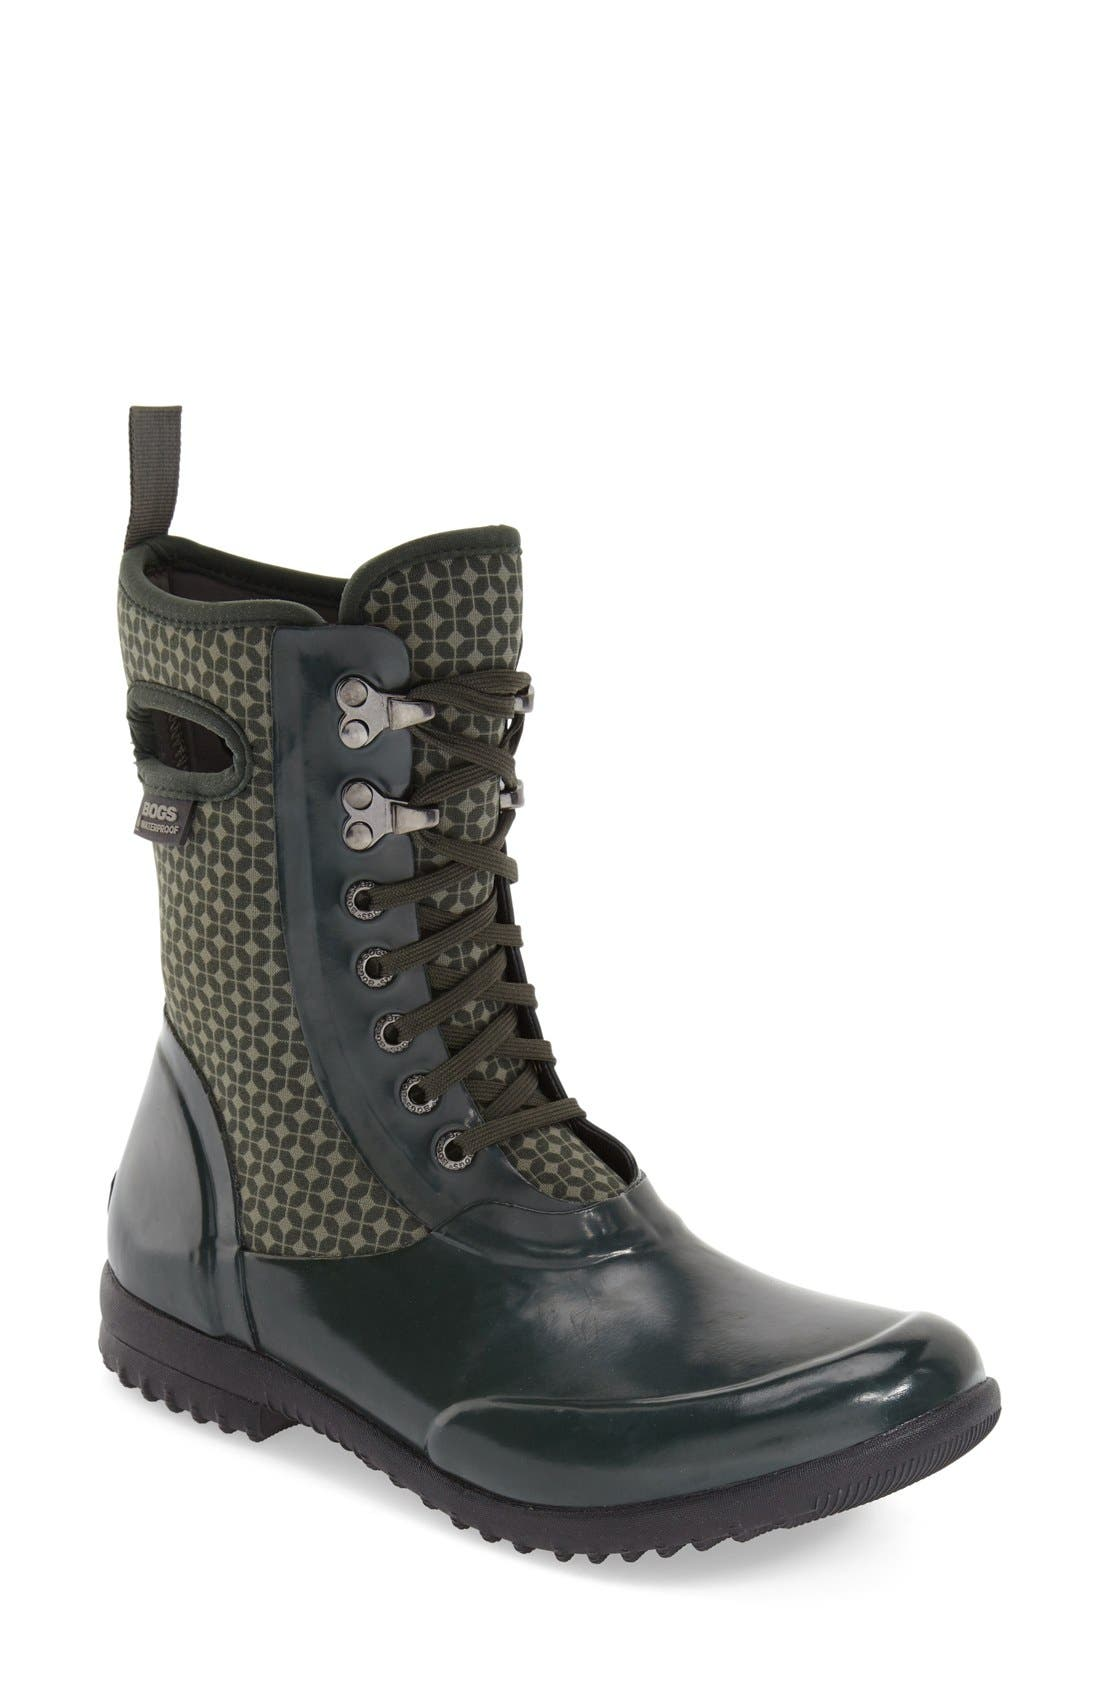 BOGS Sidney Cravat Lace-Up Waterproof Boot